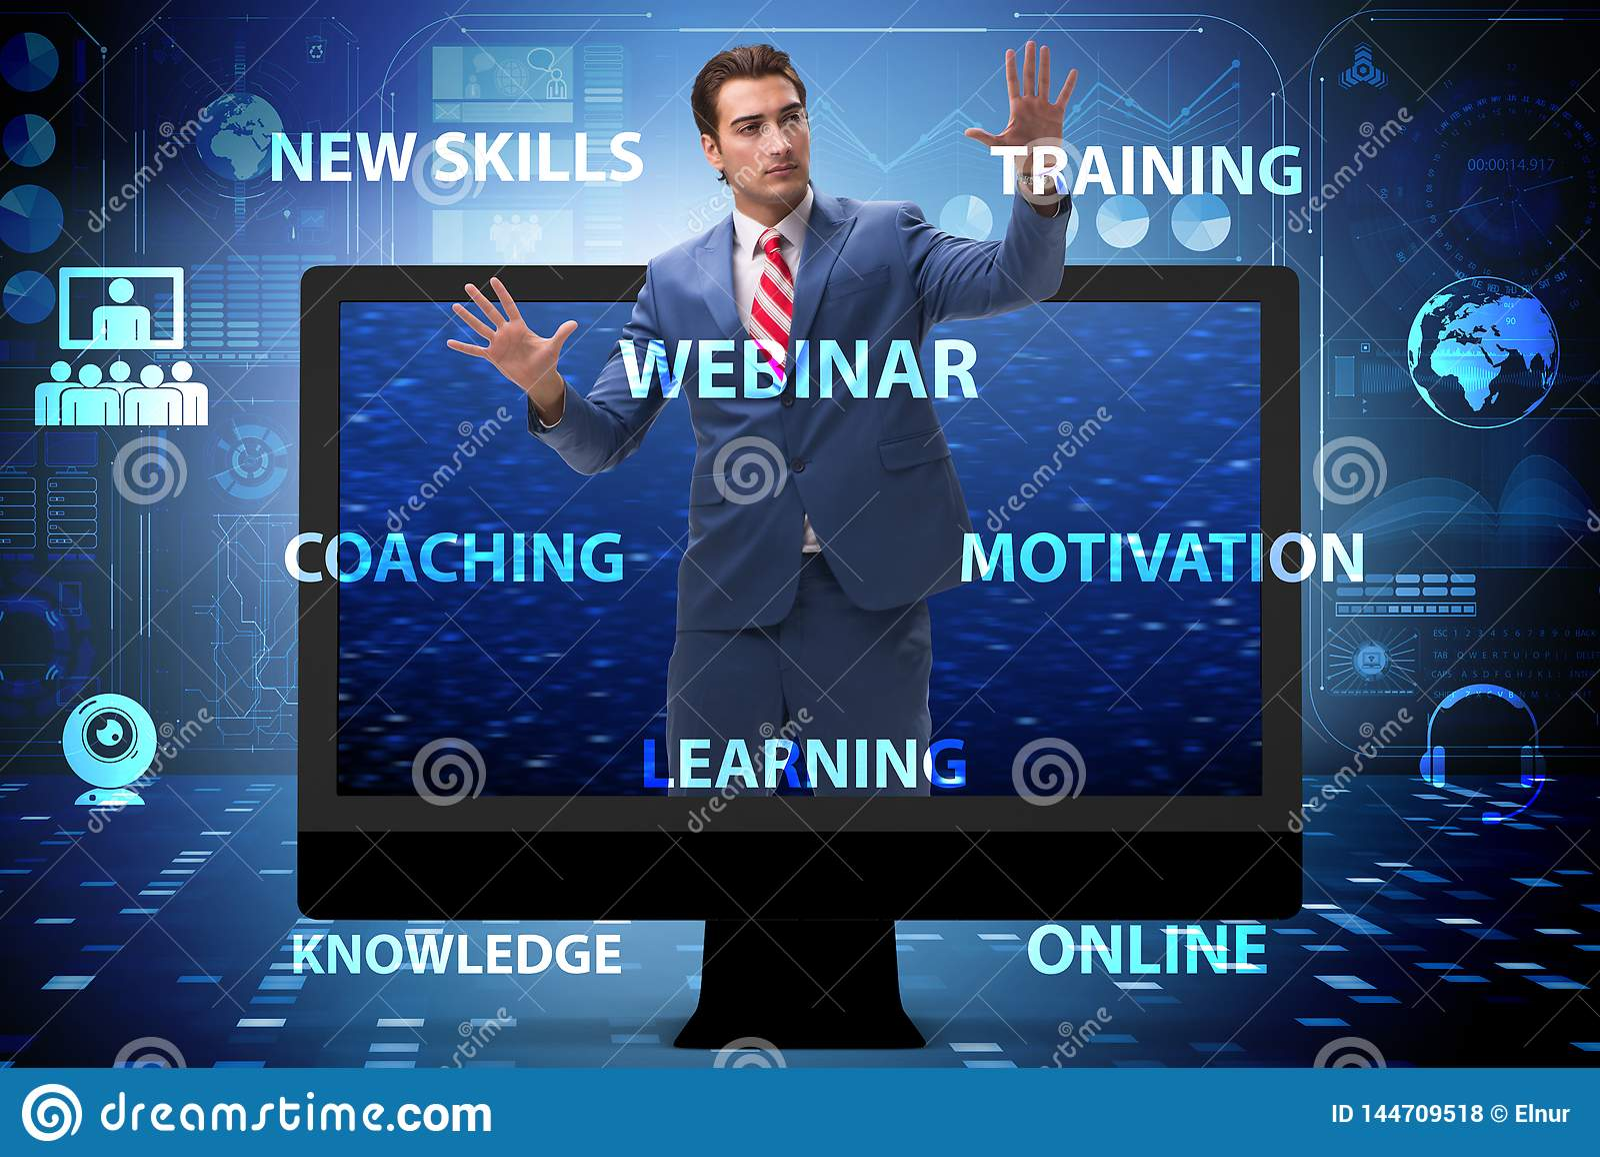 The businessman in online webinar concept